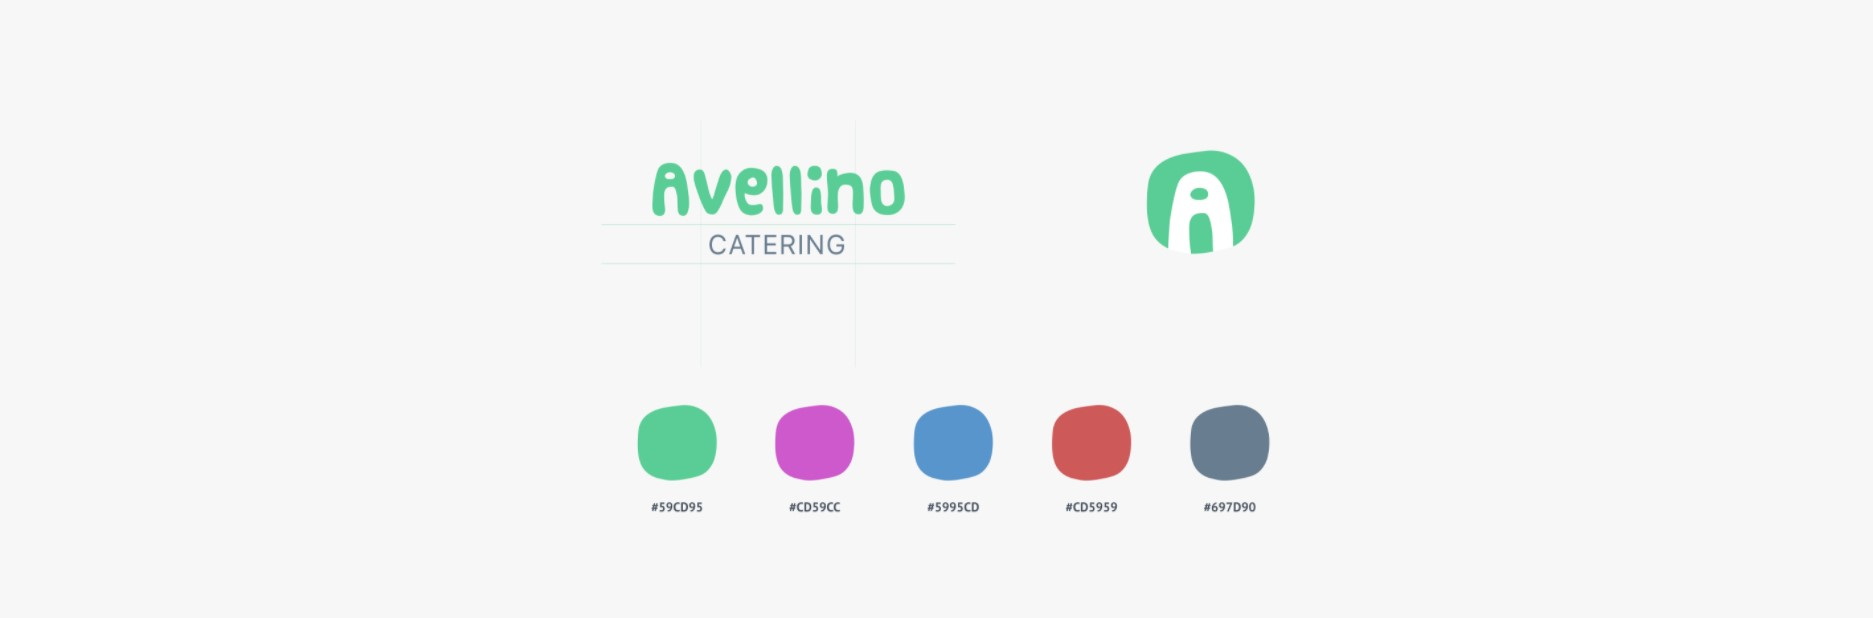 Avellino branding